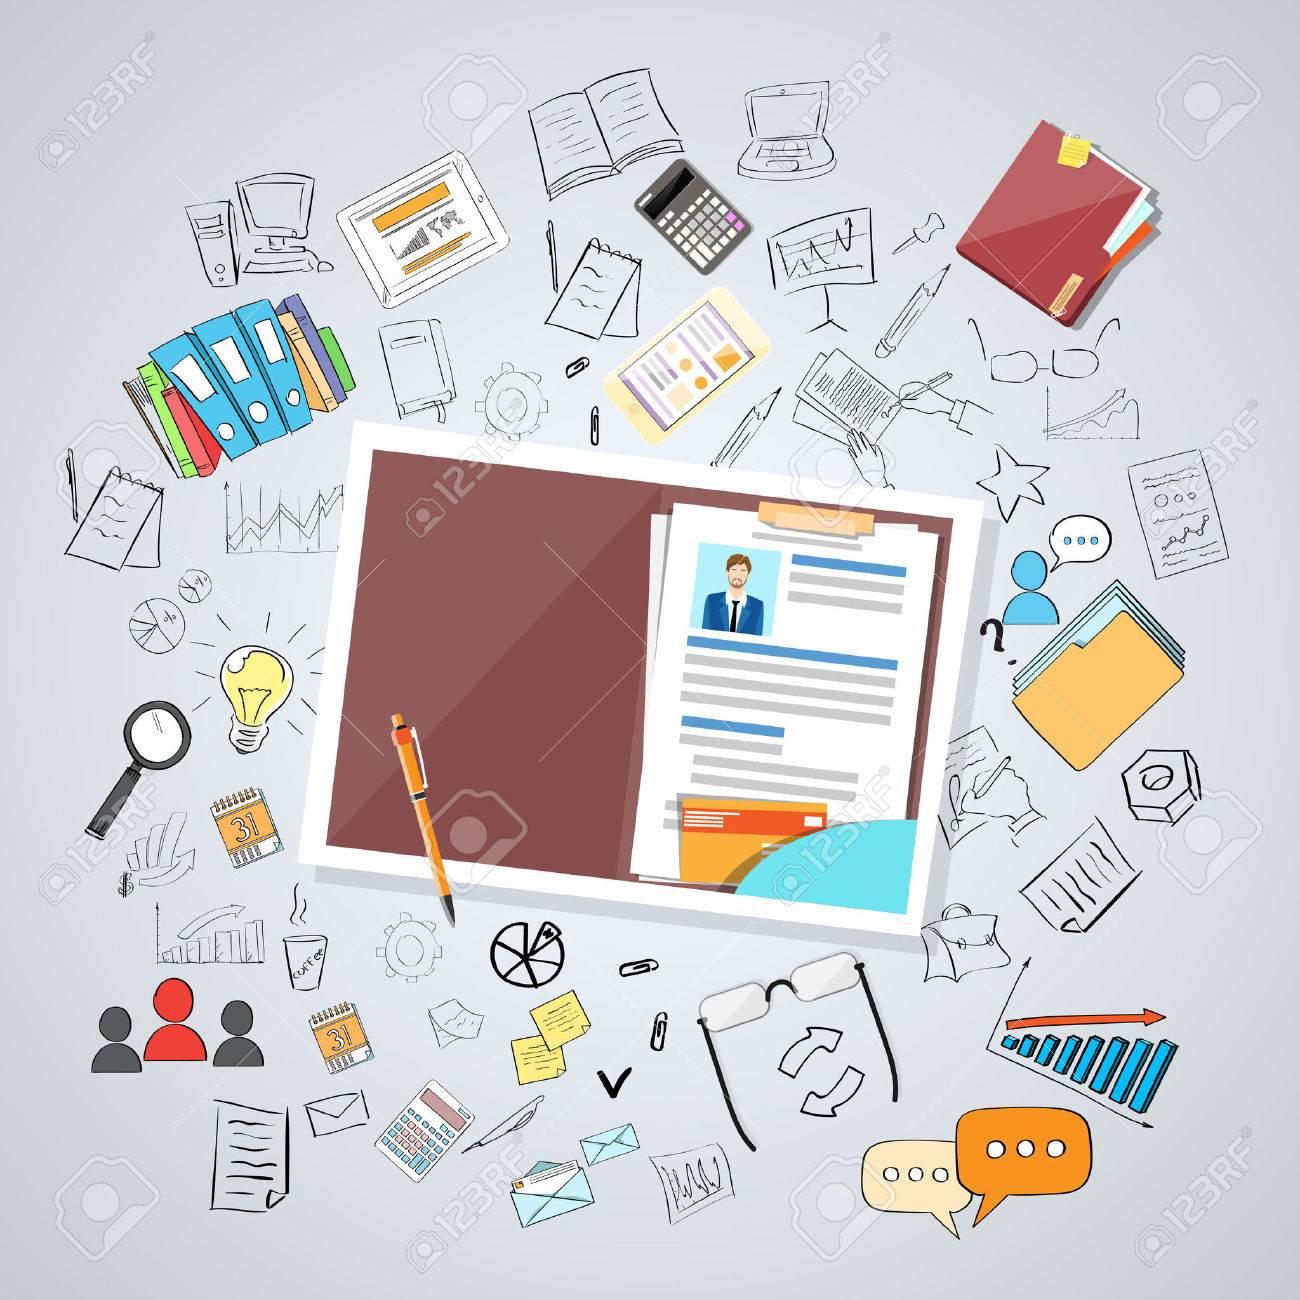 Human Resource Dokumente Lebenslauf Recruitment Candidate ...